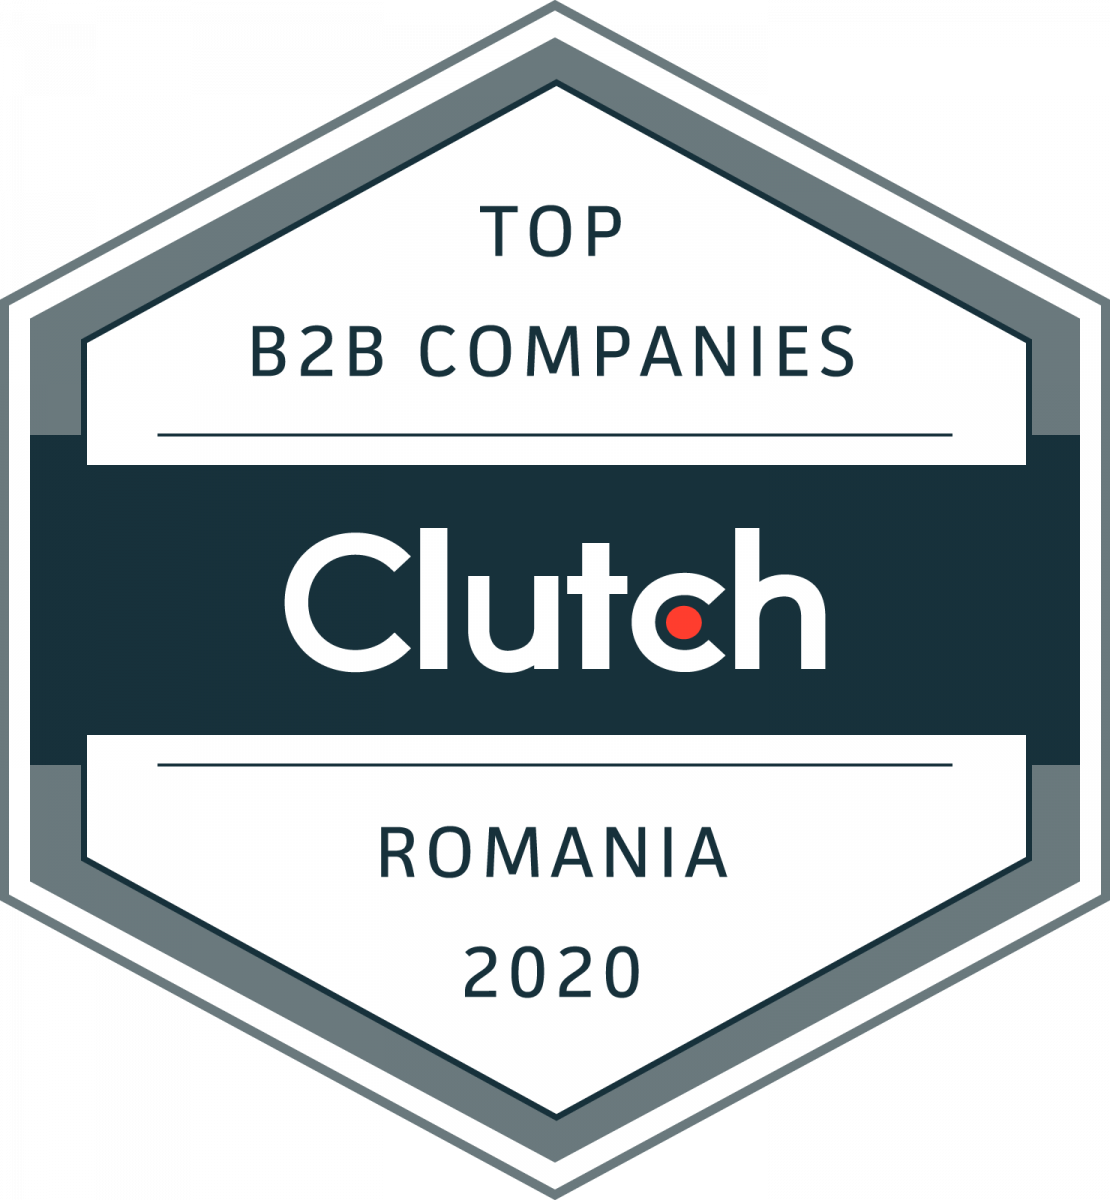 Top B2B Companies Romania